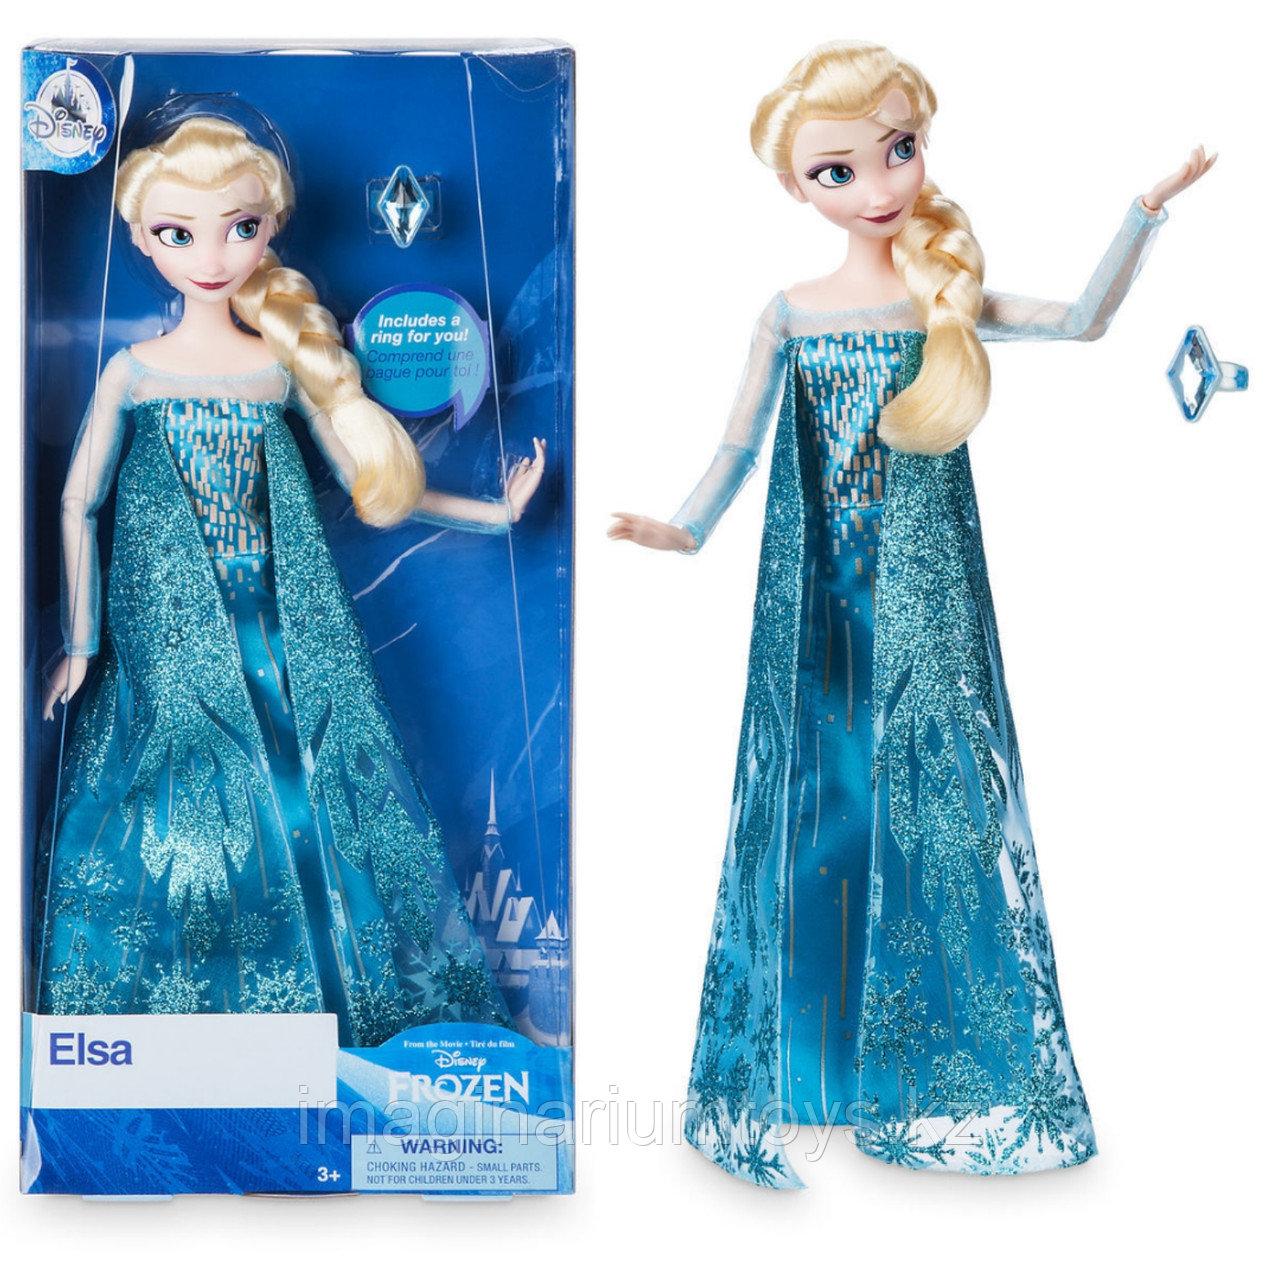 Кукла Эльза Disney - фото 1